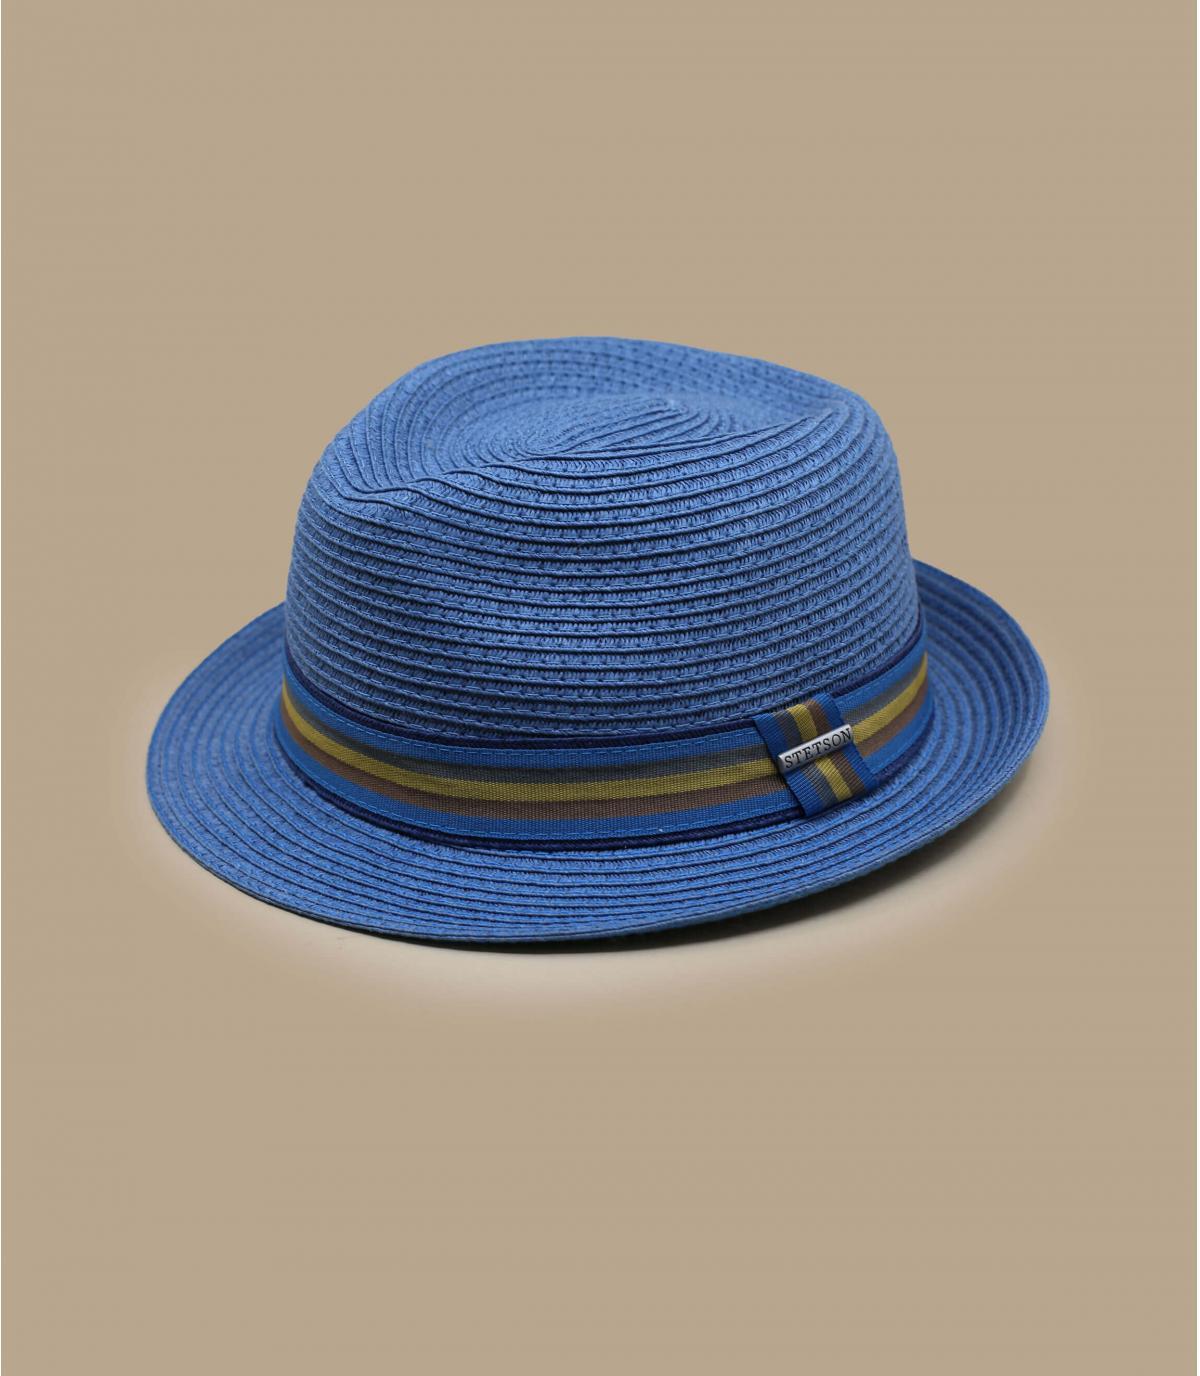 0e74fbcc Hat, cap, beanie - The headwear shop Headict.co.uk